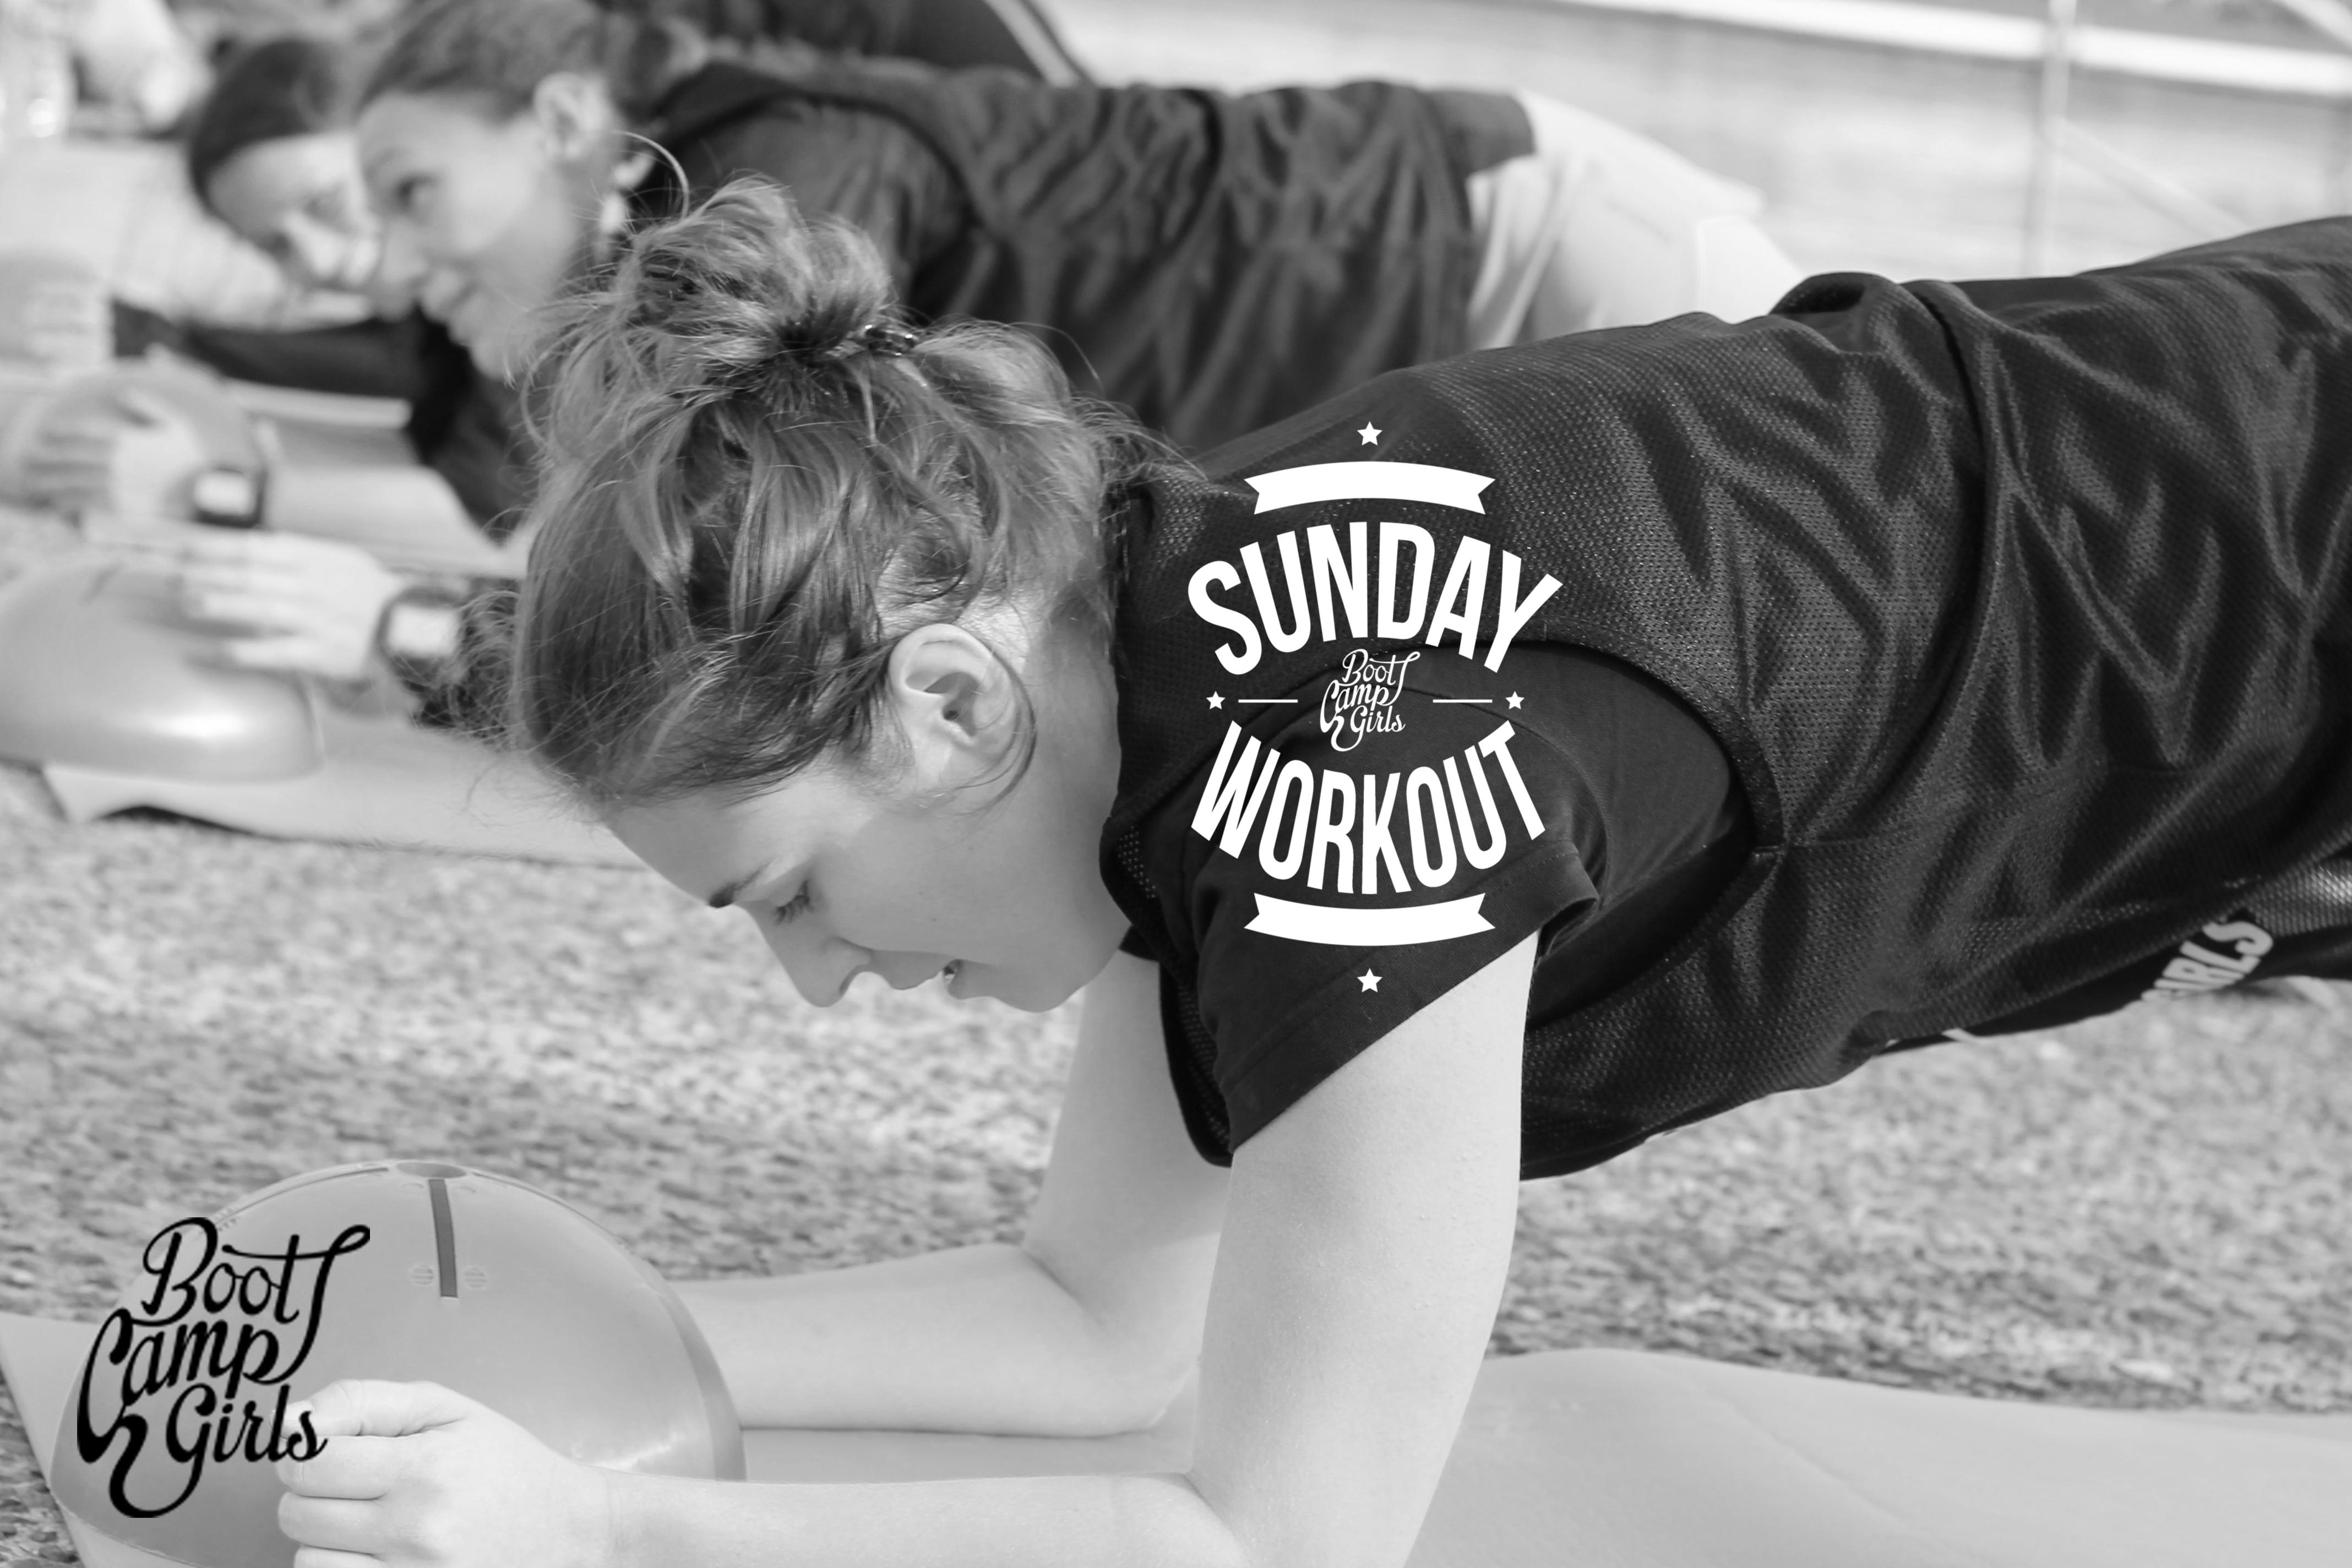 Sunday Workout Boot Camp Girls